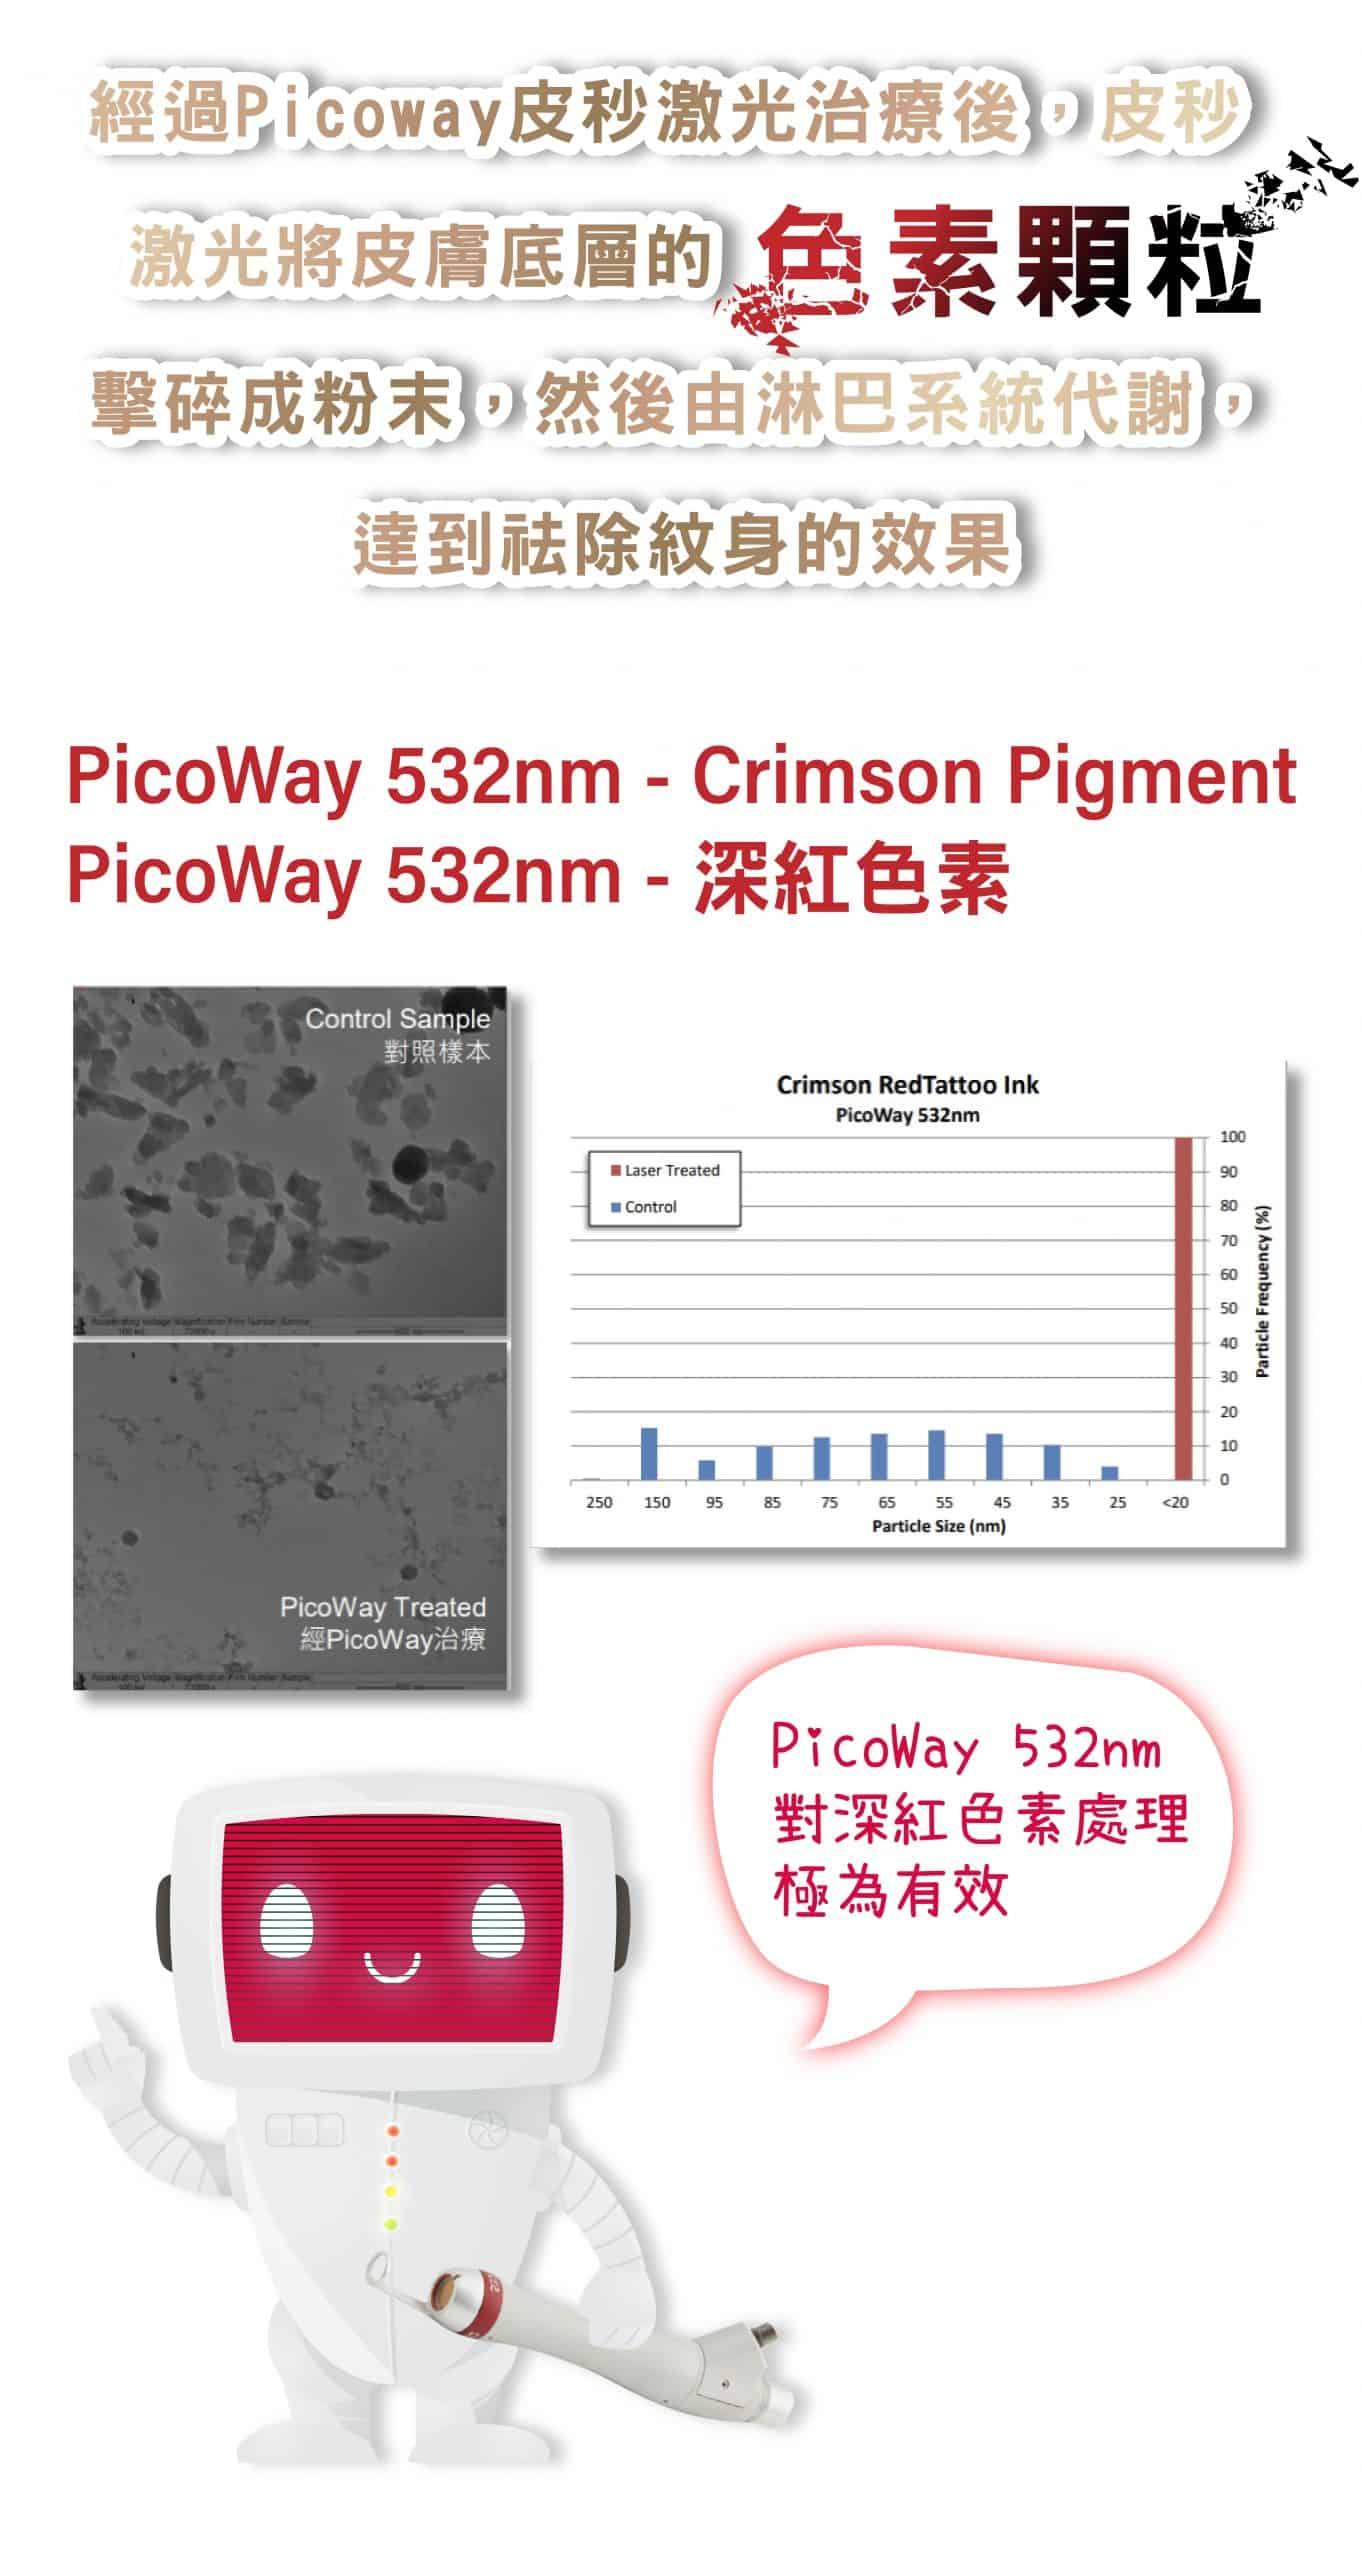 Picoway_tattoo Pico tattoo m 37 1 scaled